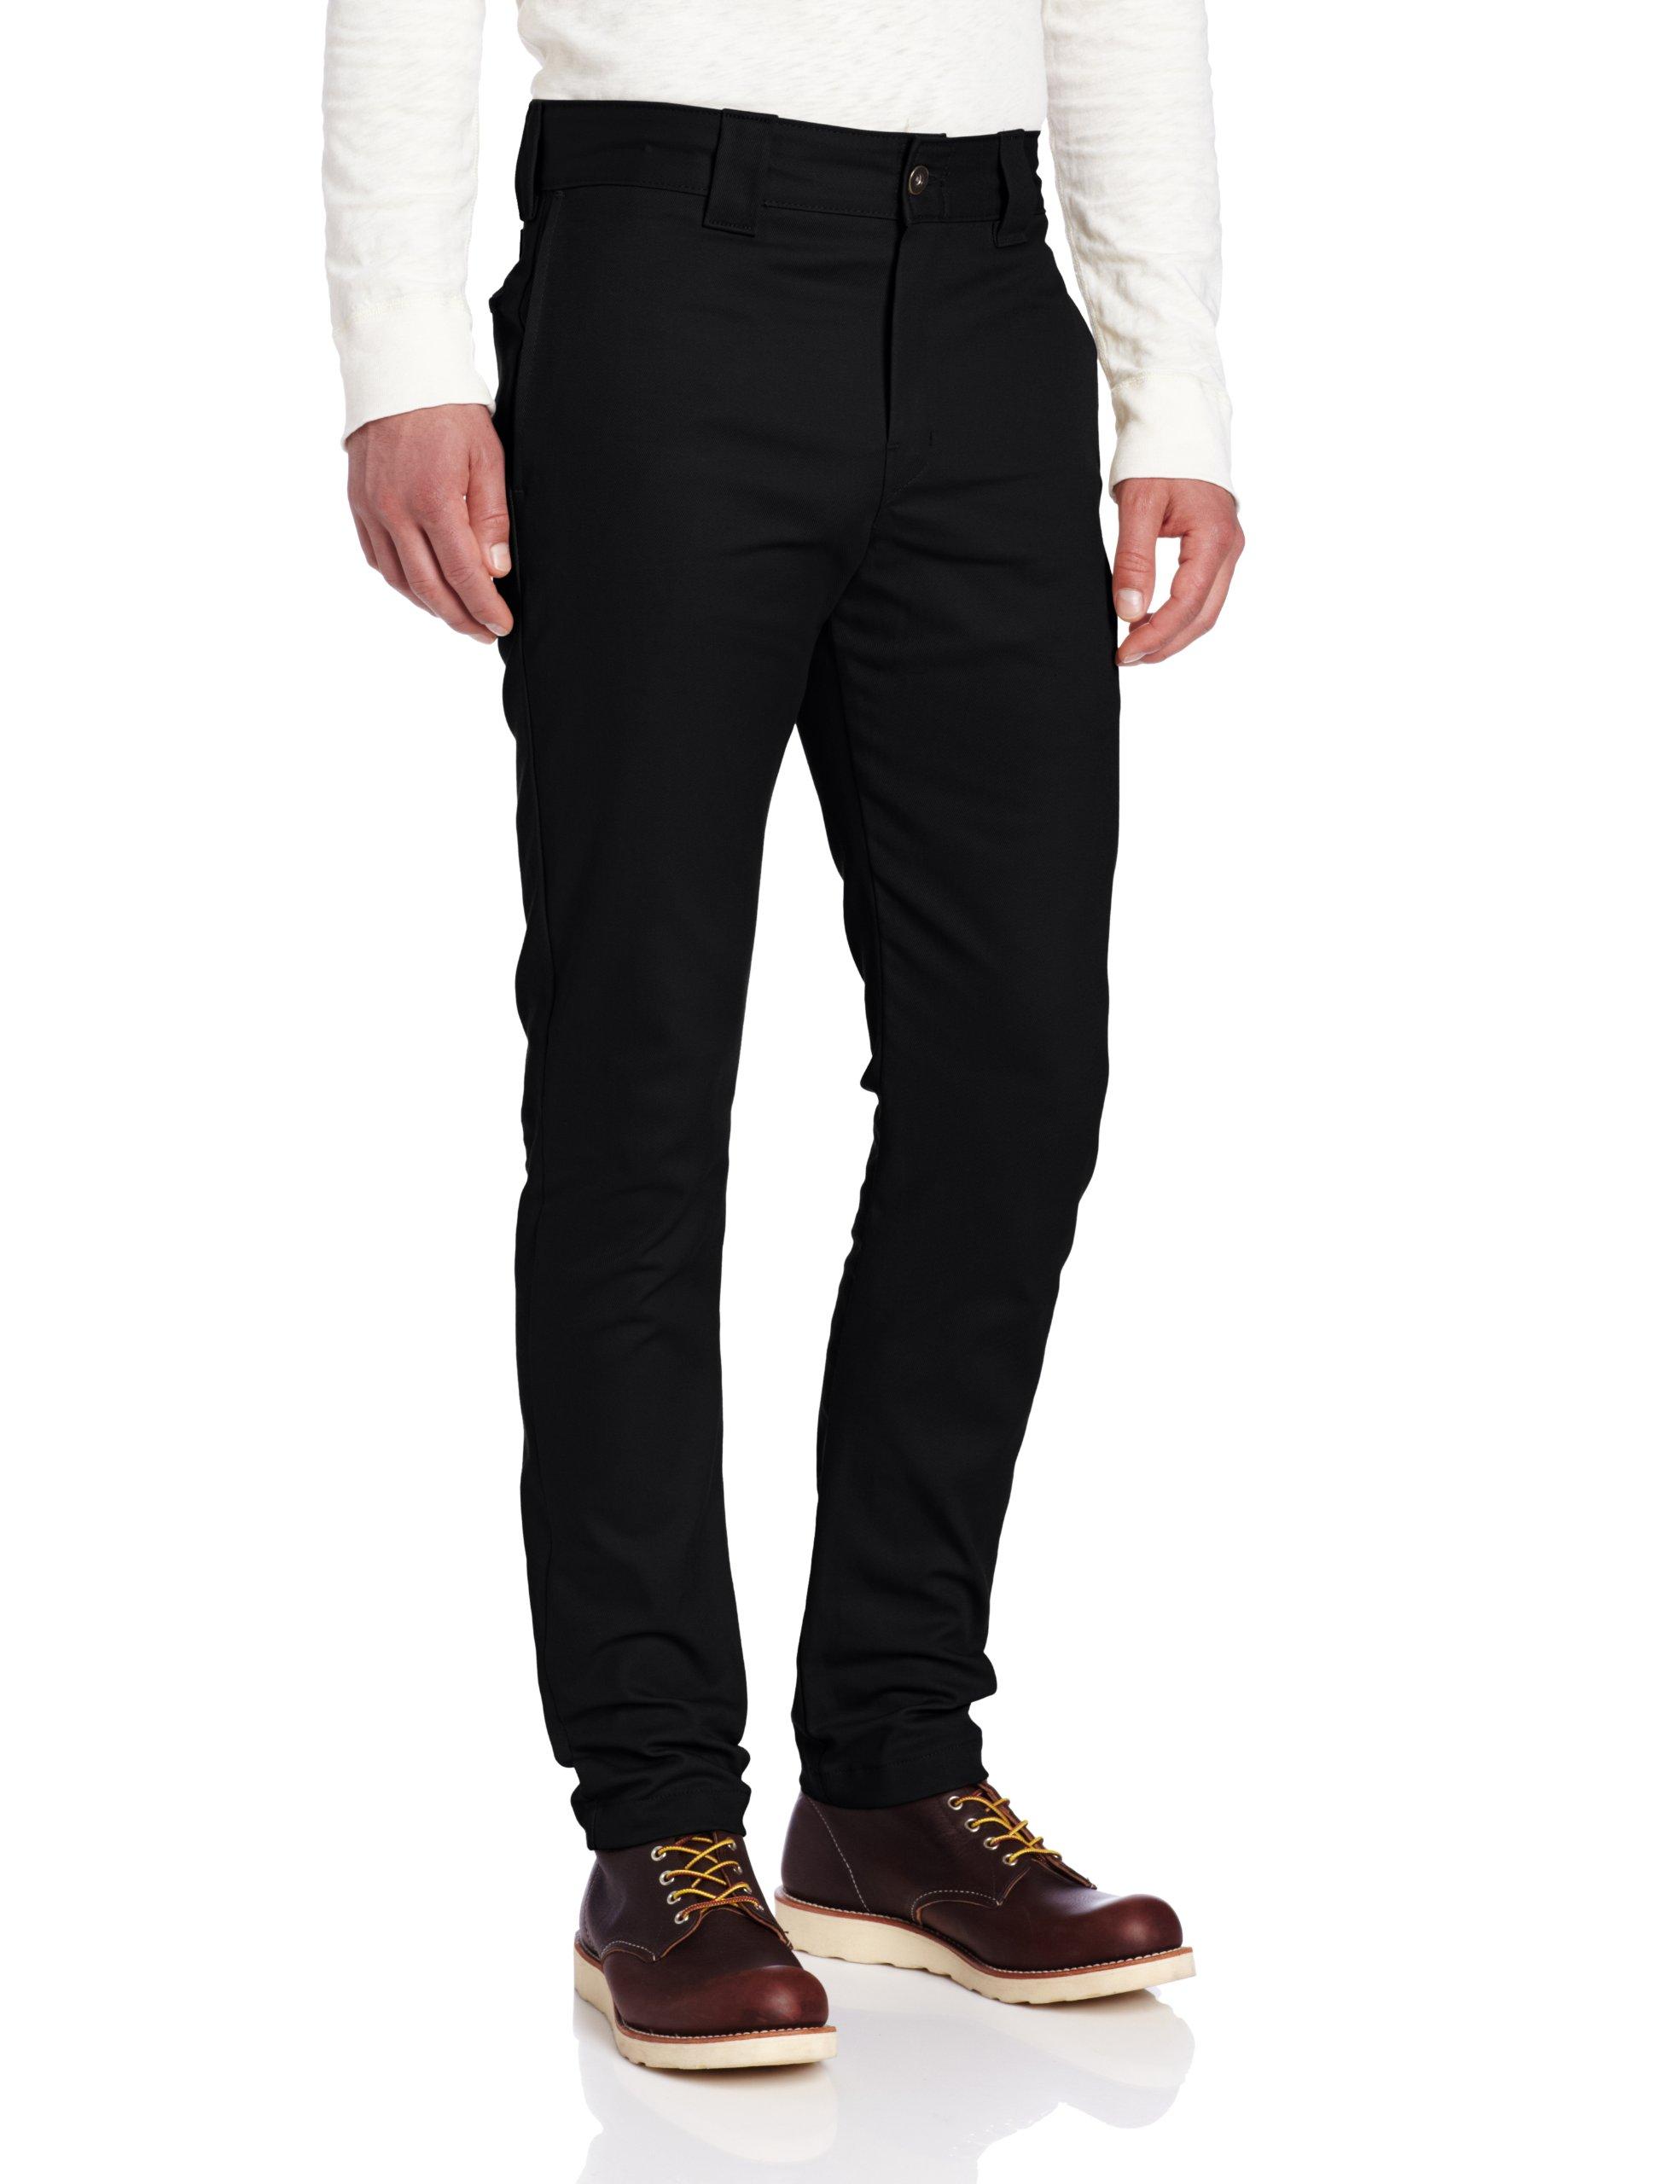 Dickies Men's Slim Skinny Fit Work Pant, Black, 32x34